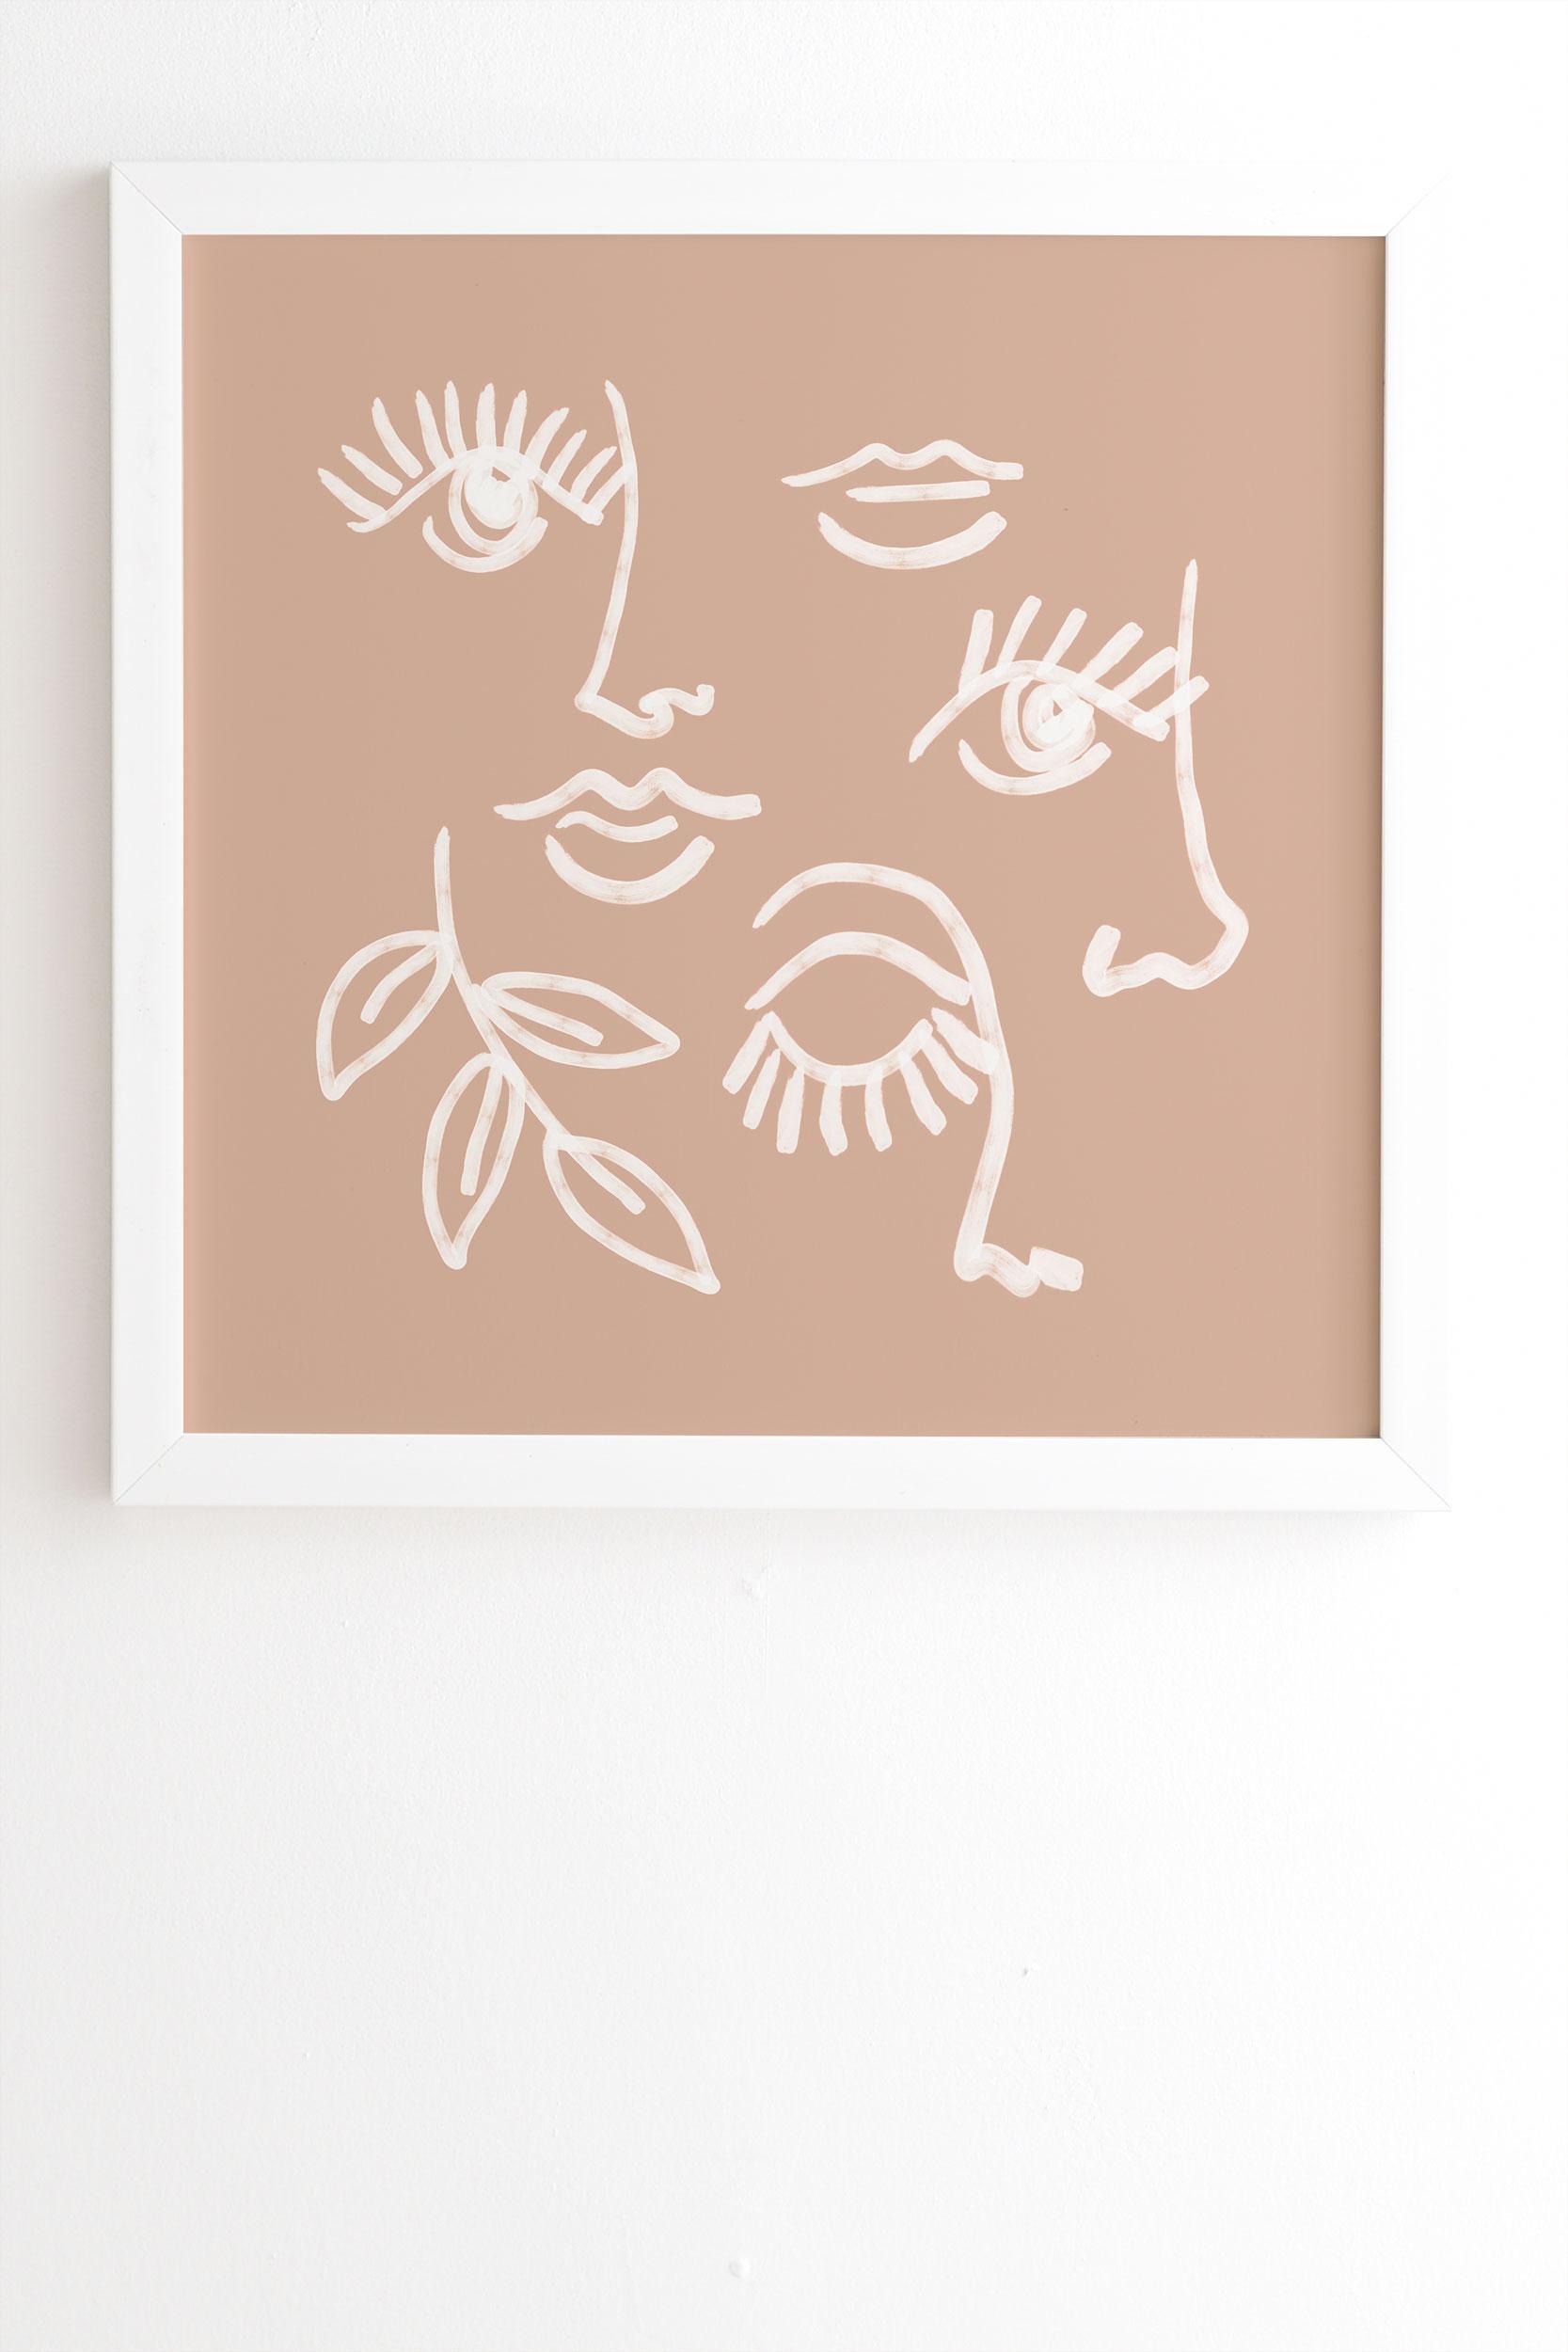 "Line Art Portraits On Pink by Emanuela Carratoni - Framed Wall Art Basic White 8"" x 9.5"""